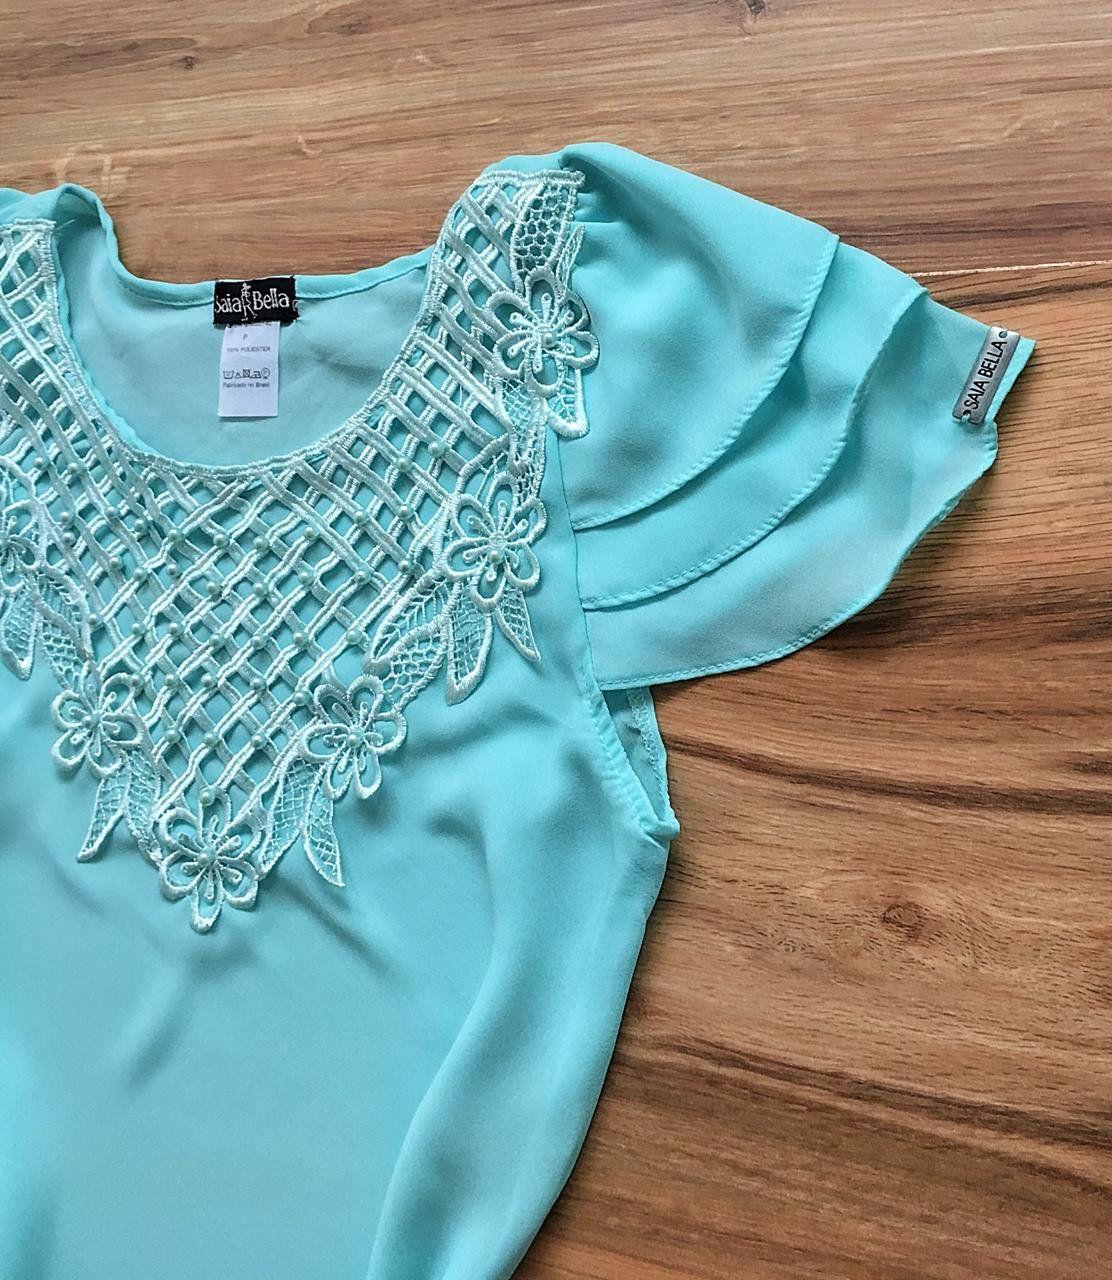 Blusa de Renda Saia Bella - SB9972 azul bebe